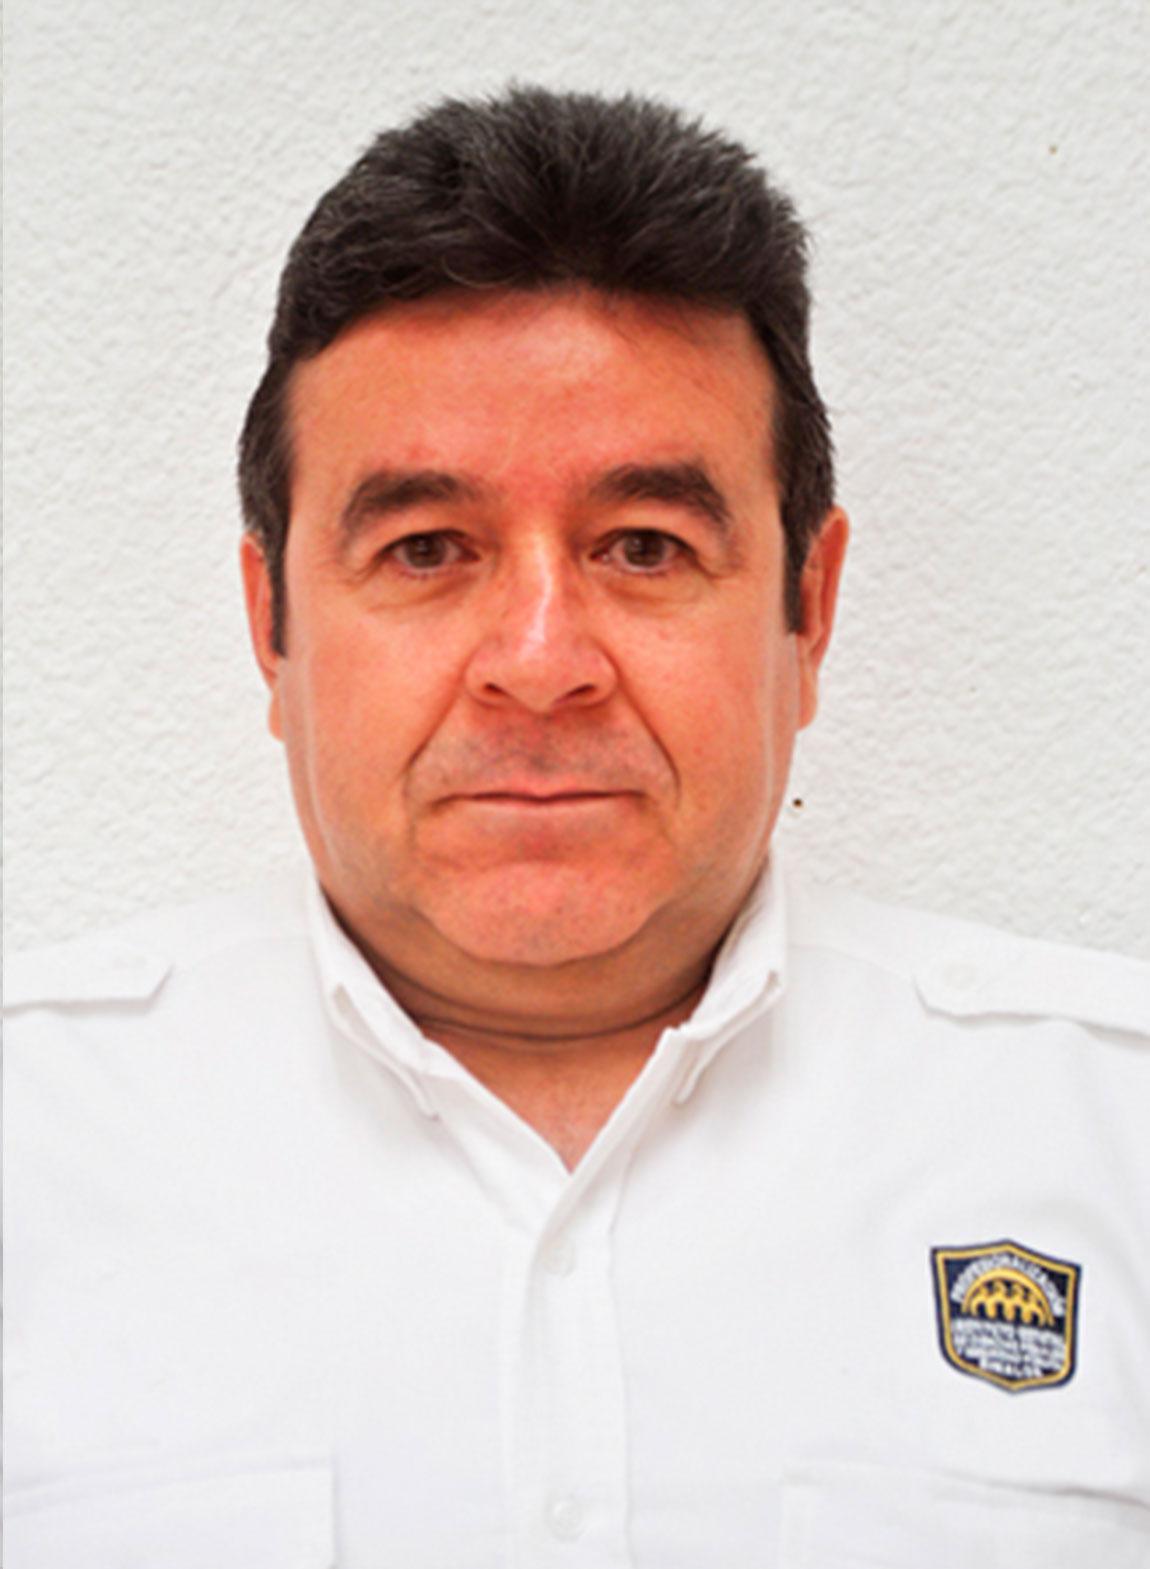 Lic. Sergio I. Celaya Valenzuela